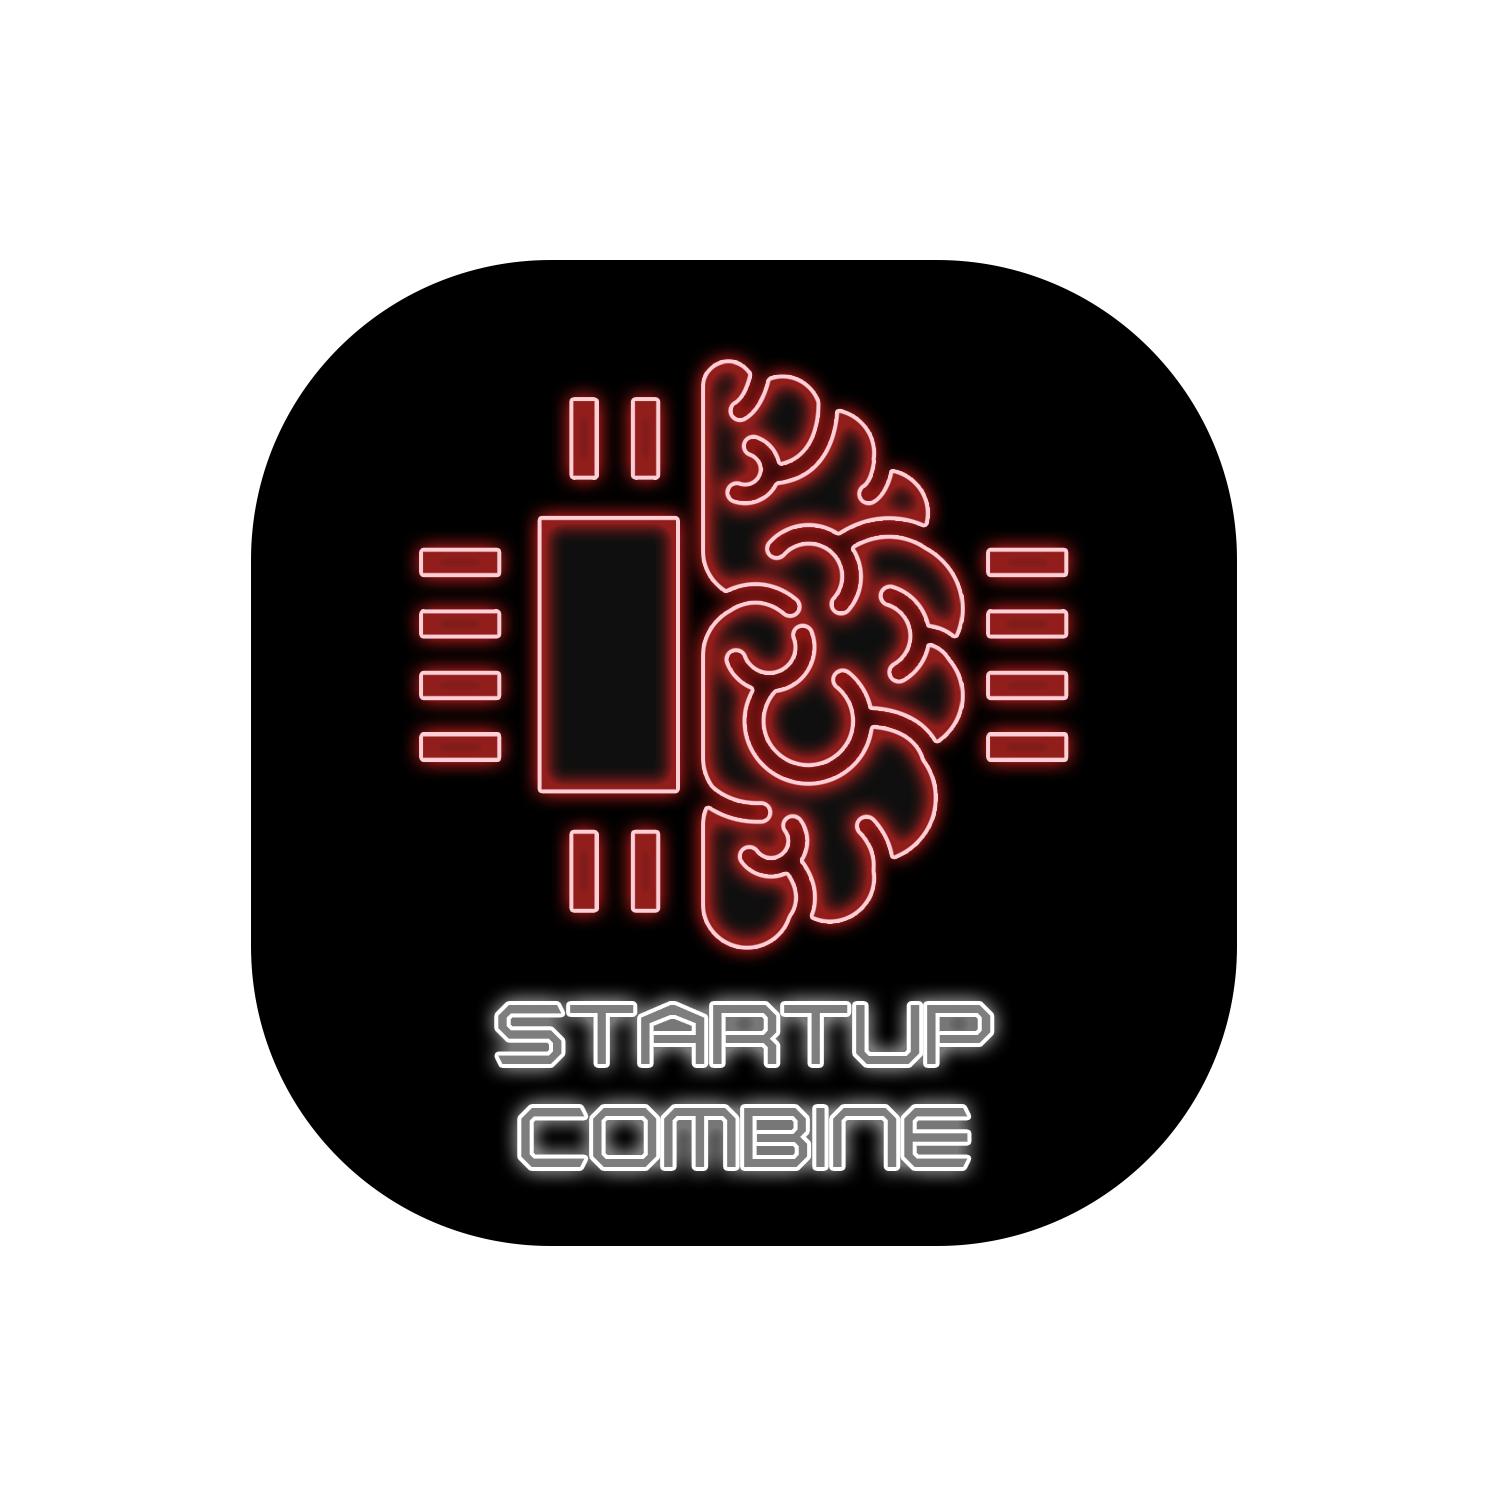 STARTUP X - COMBINE PROGRAM